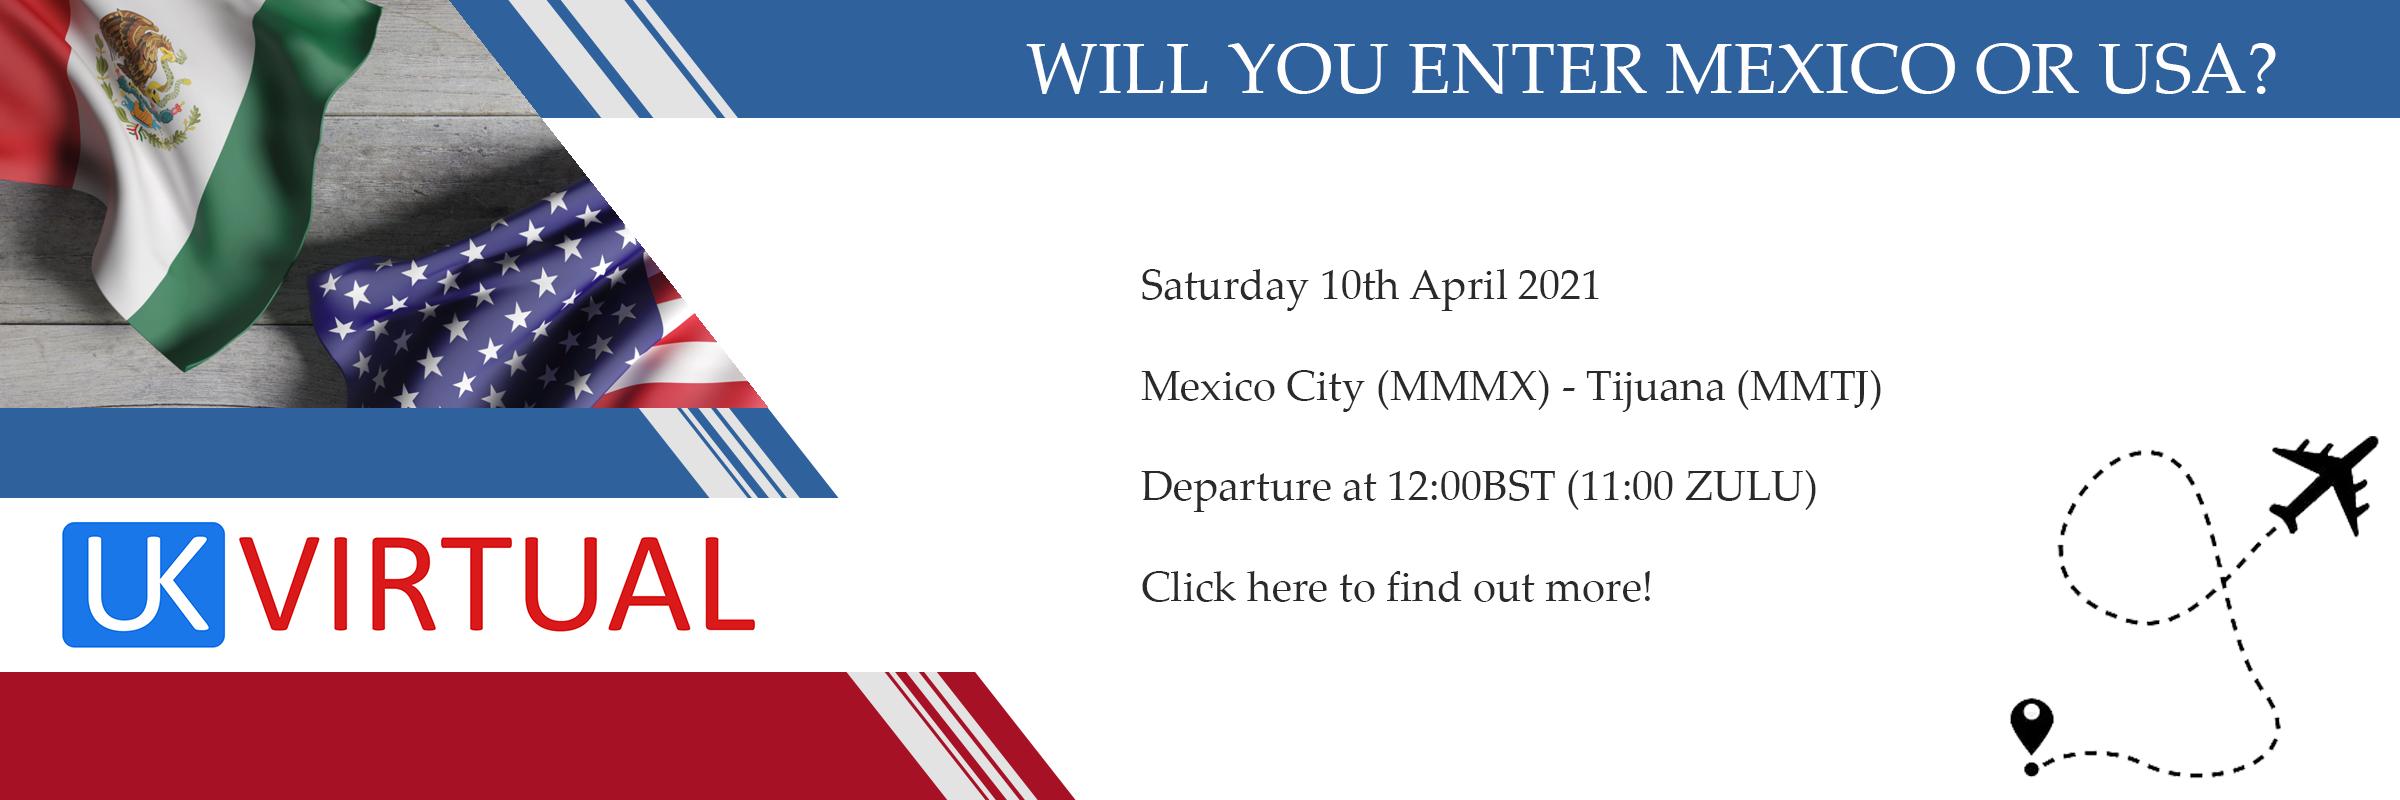 New Group Flight – 10/04/2021 11:00